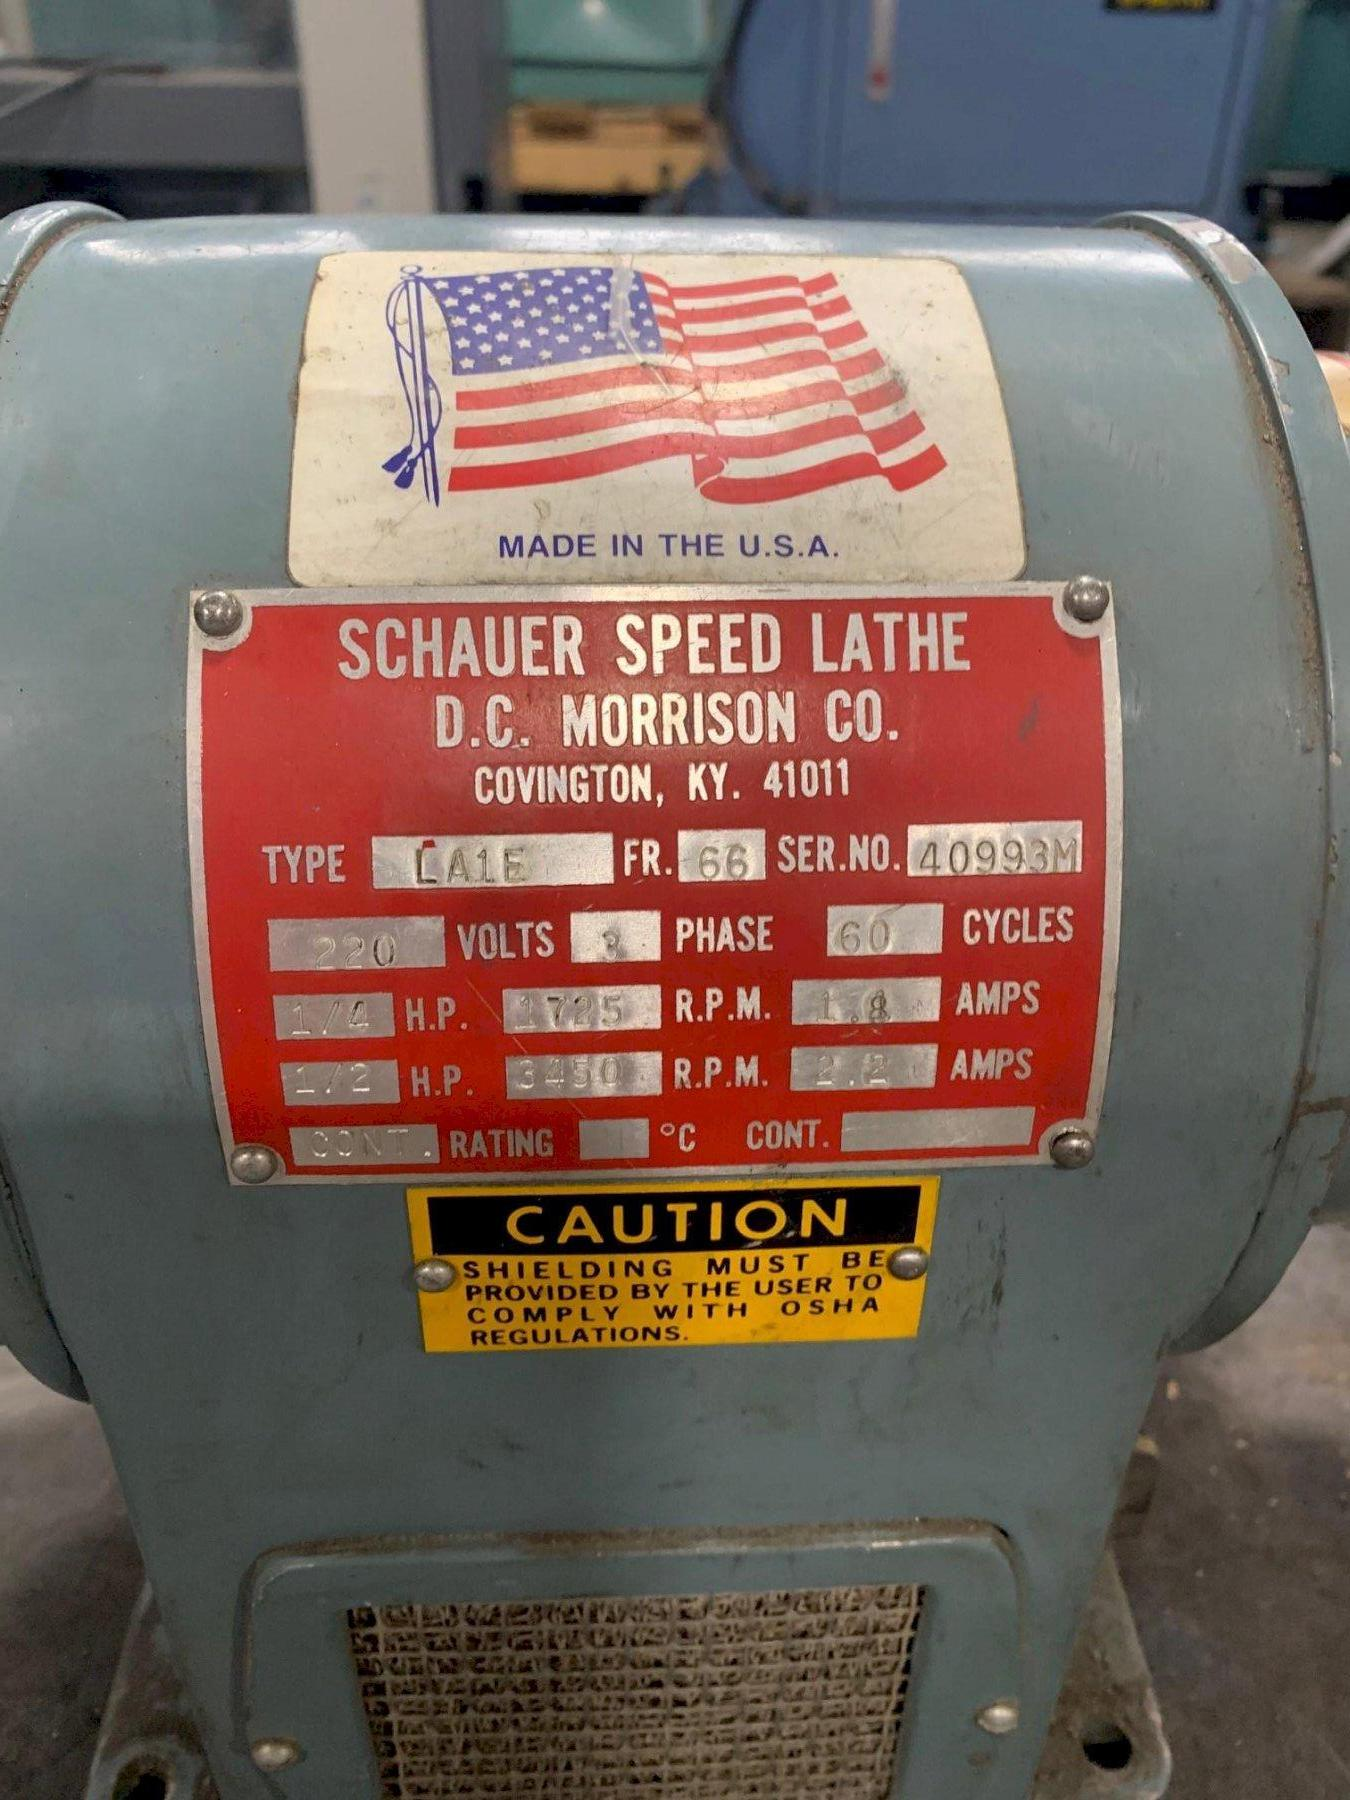 USED SCHAUER SPEED LATHE MODEL LA1E, Stock # 10820